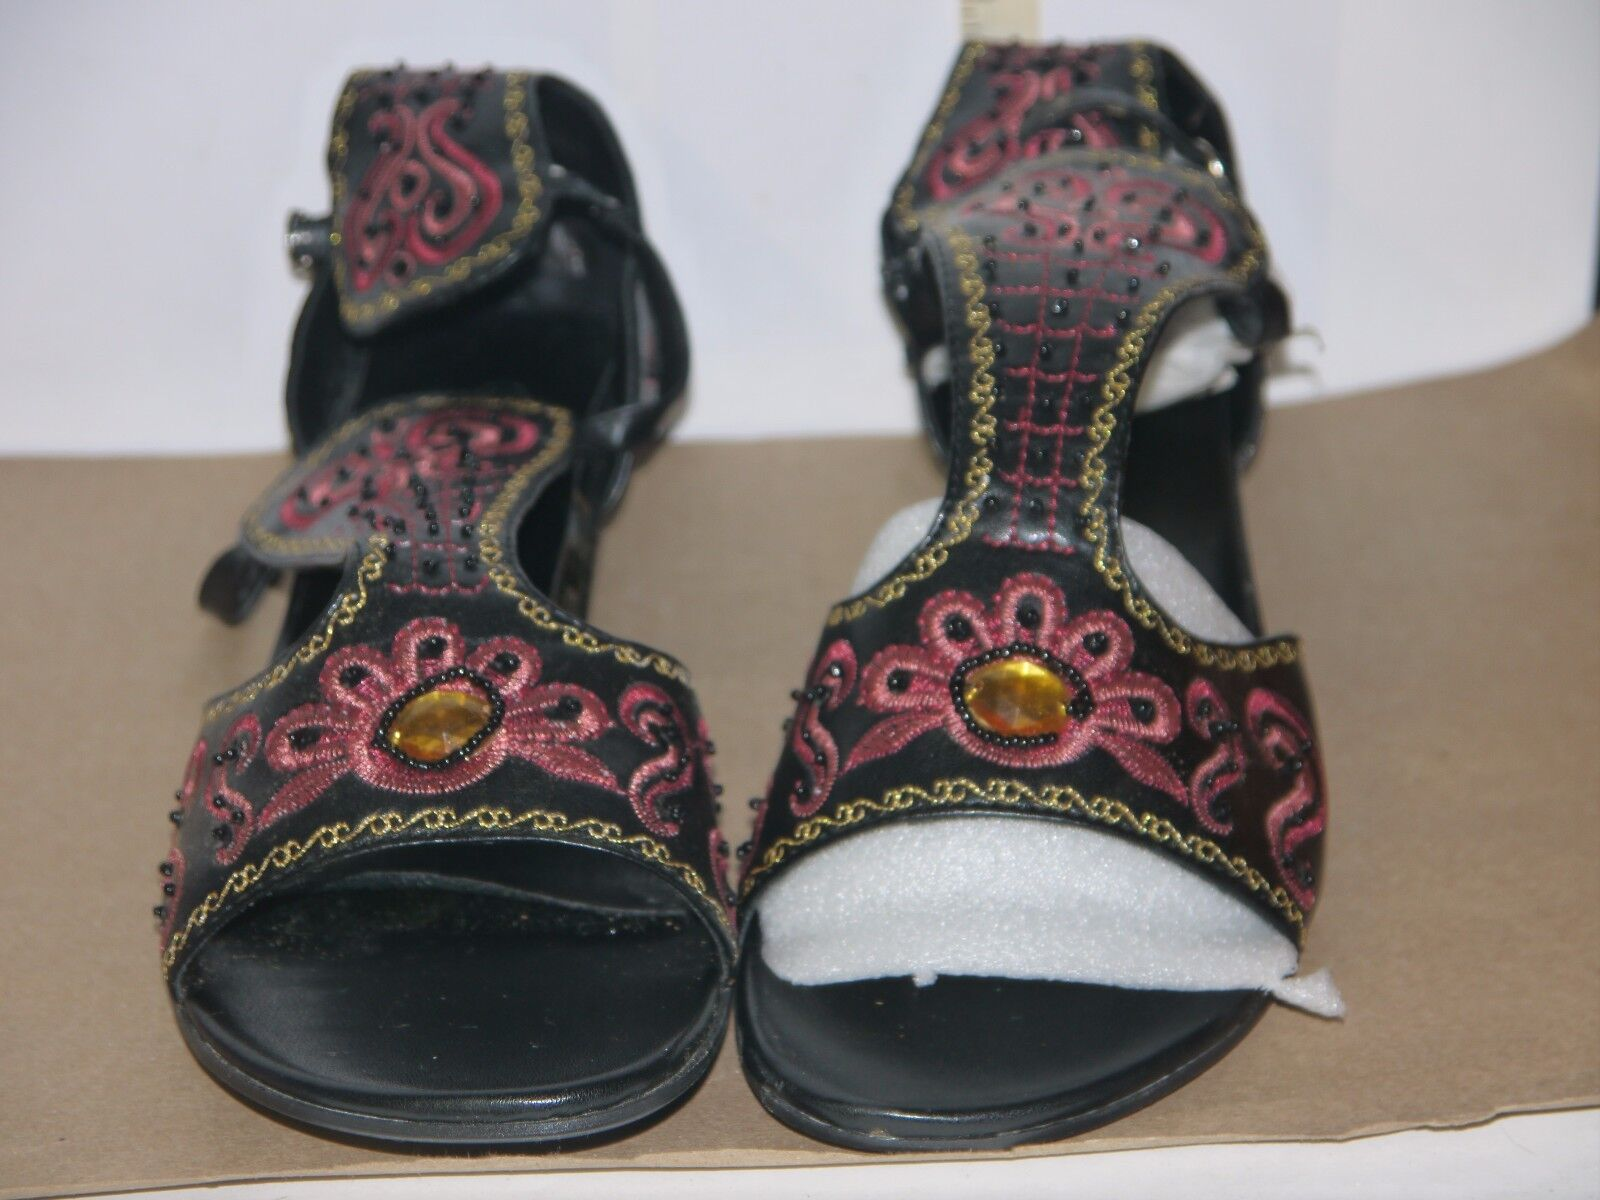 Destiny Woman's & Black Leather Sandal Size 11 Low Heel/Pink & Woman's Gold Appliques NIB b278b0